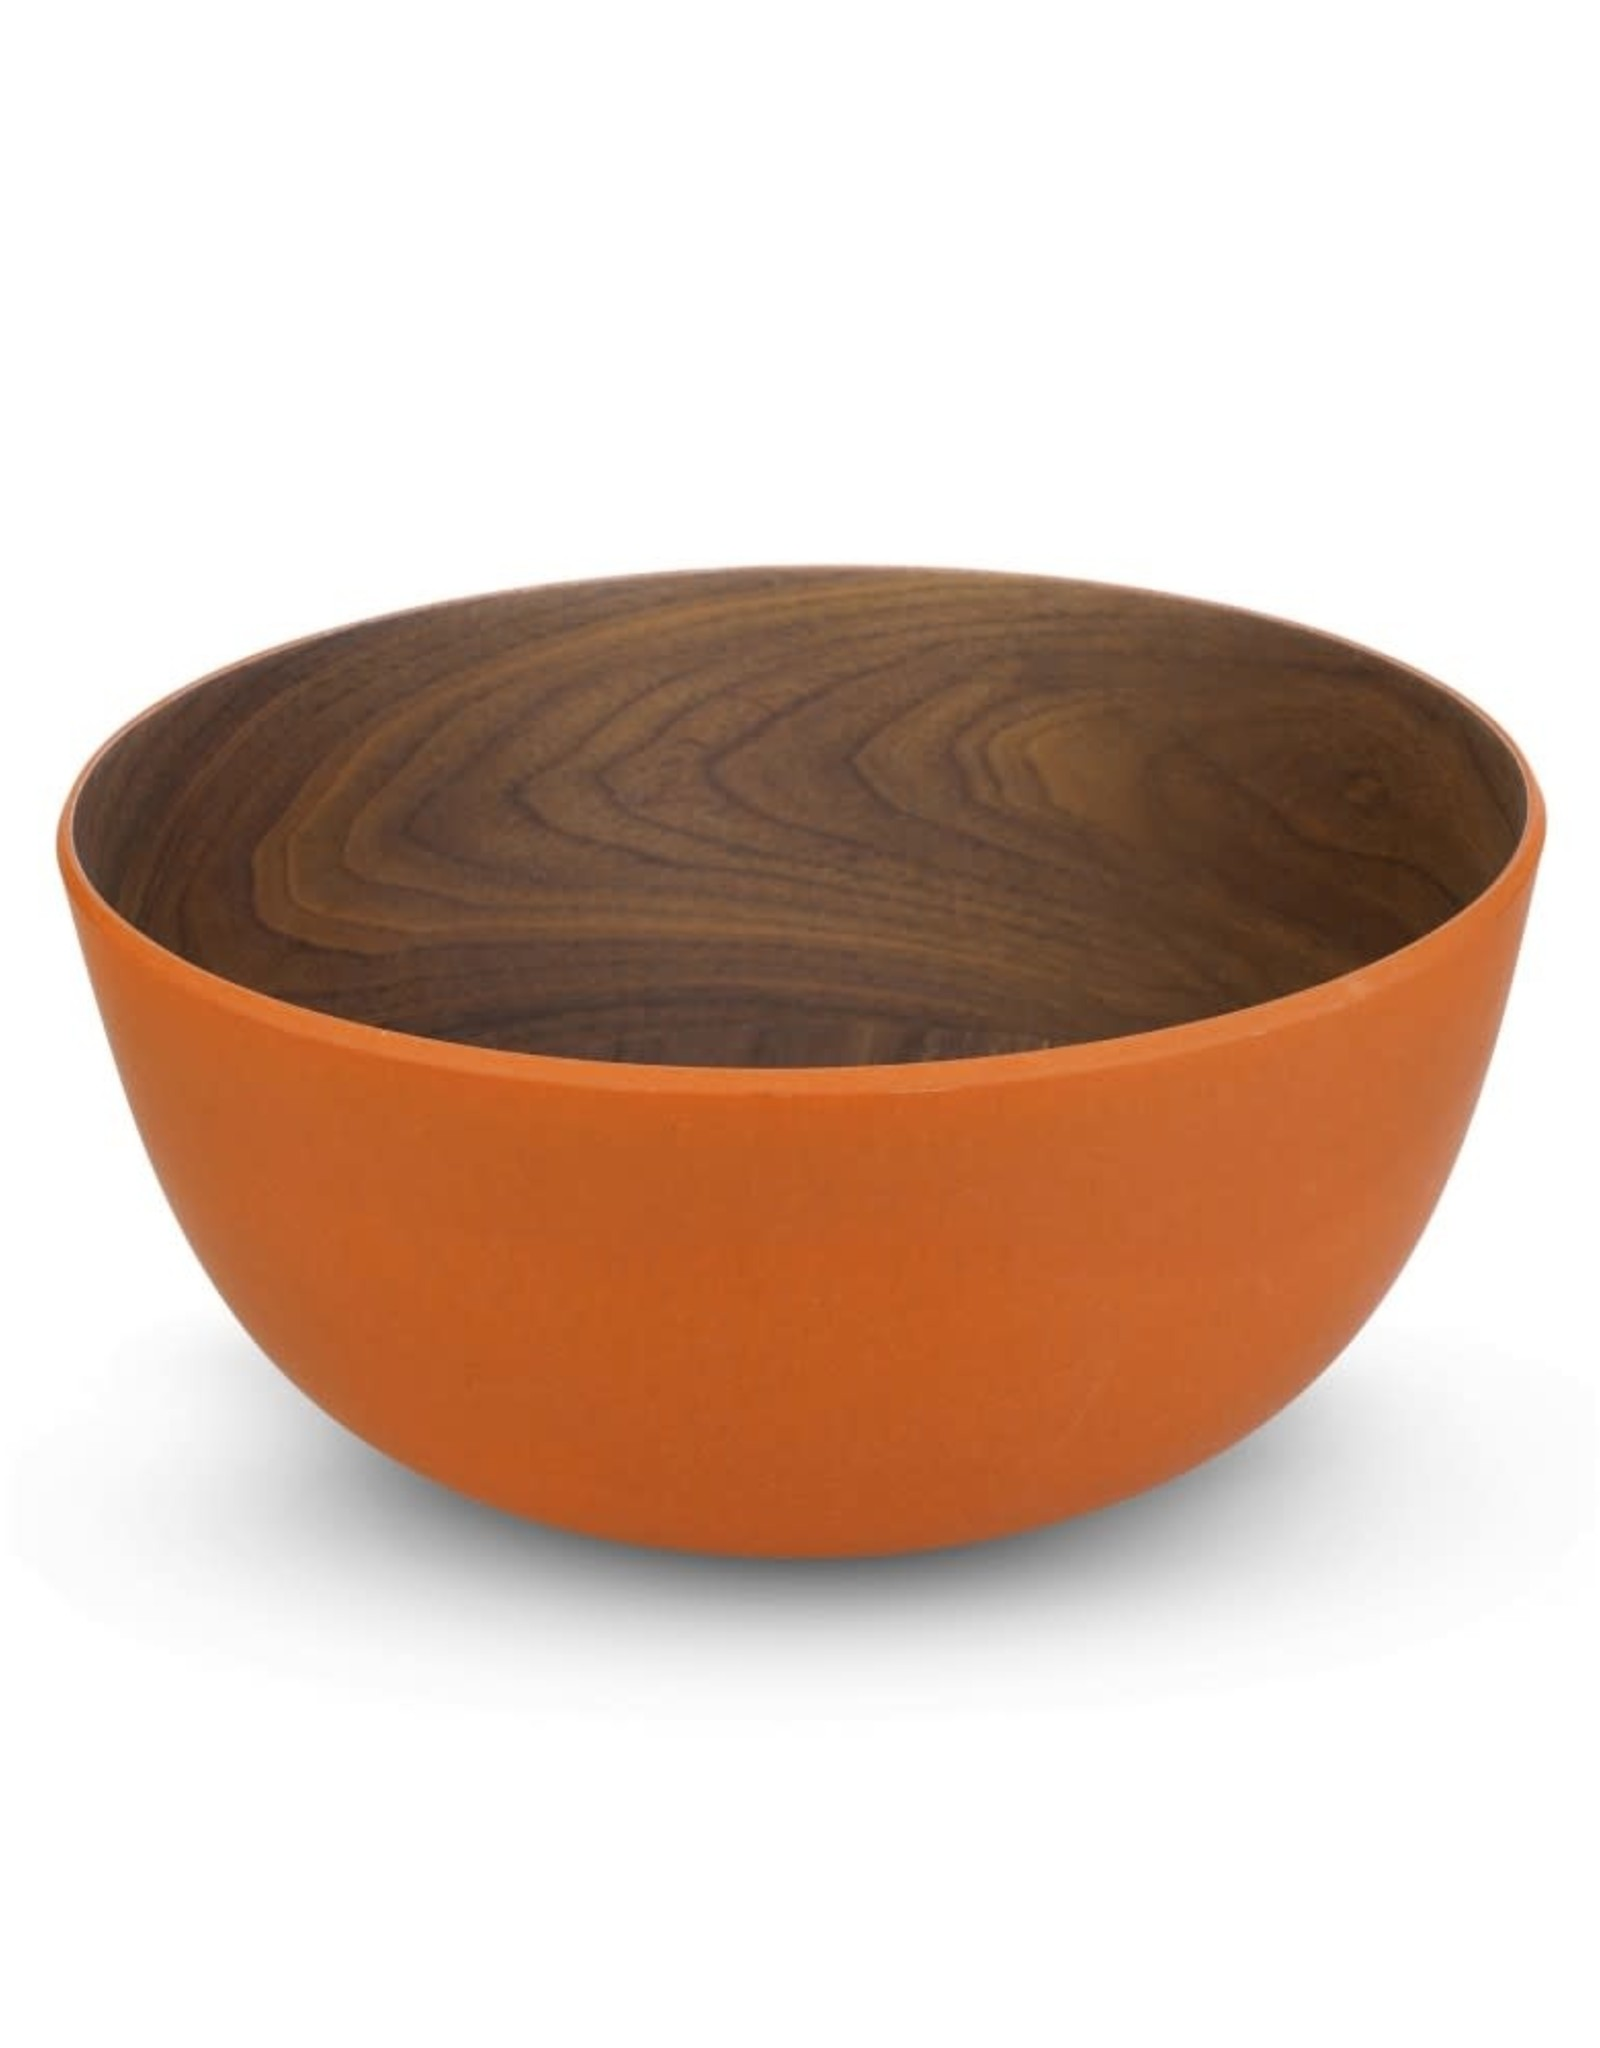 "7"" bamboo serving bowl"